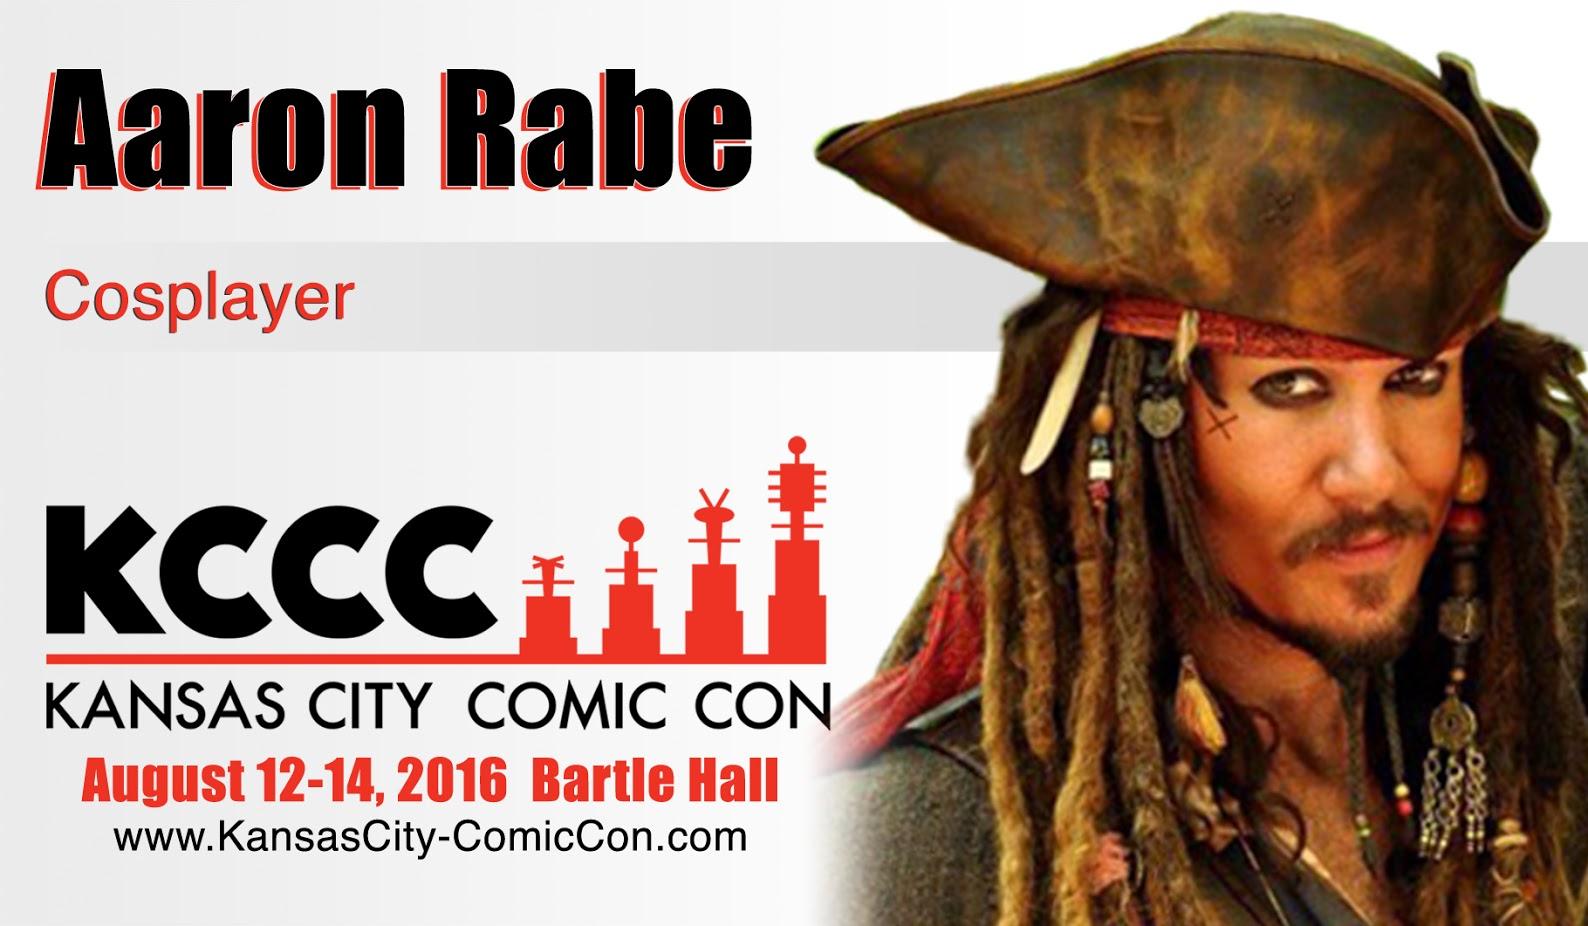 KCCC_Aaron-Rabe.jpg